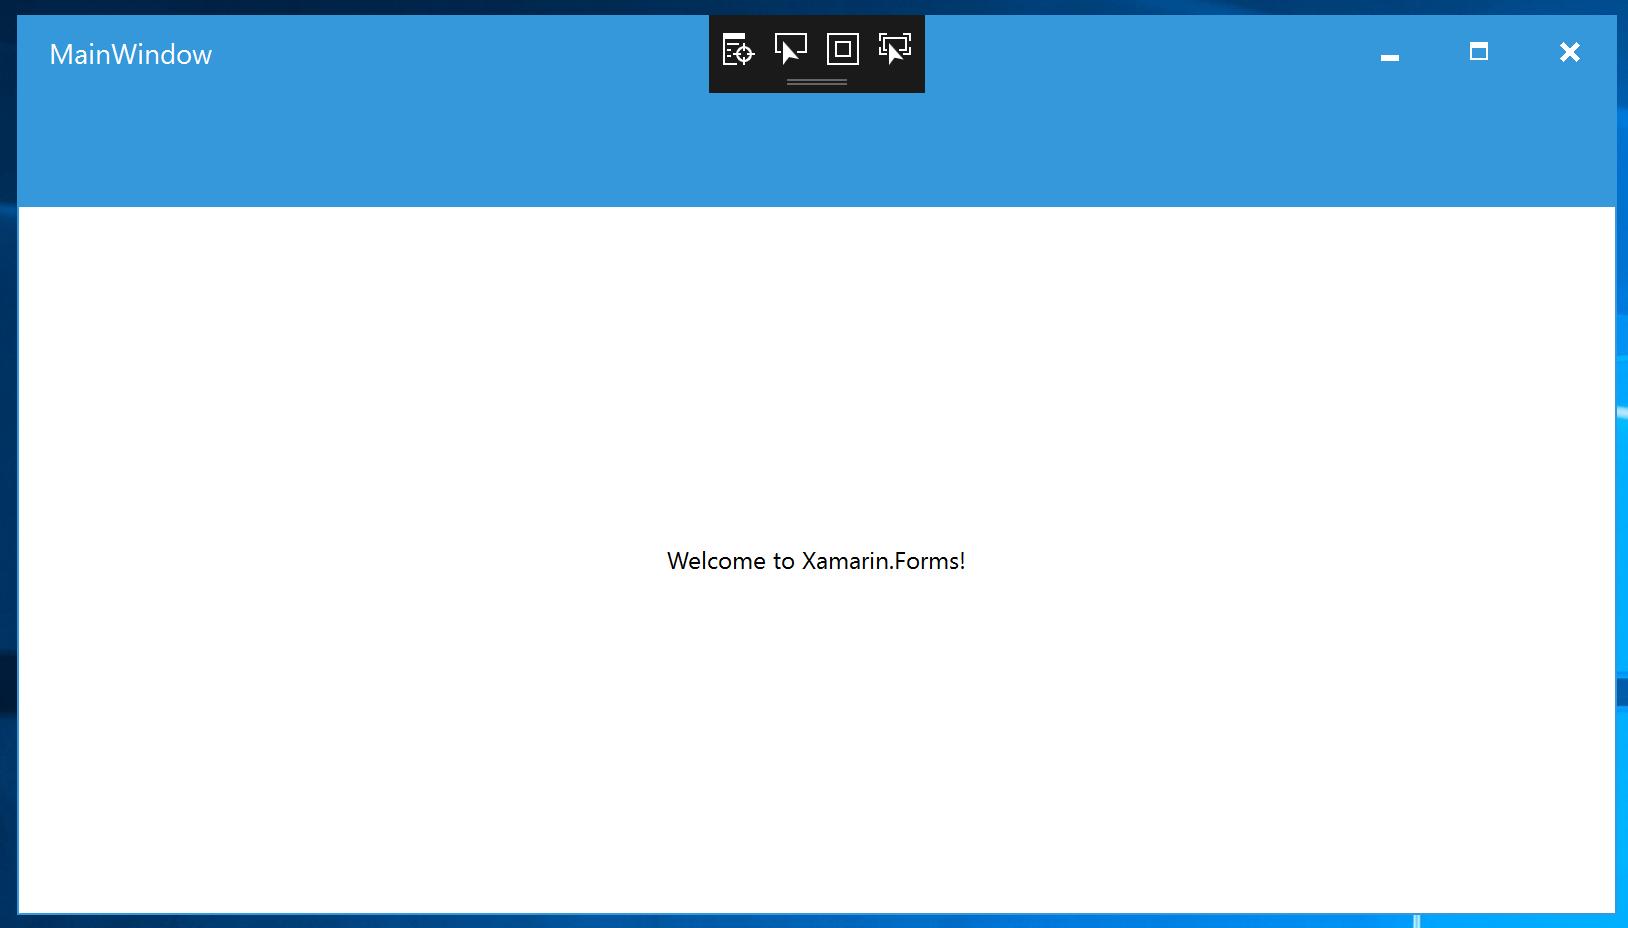 XF 3 0 New Feature: Create WPF Application using Xamarin